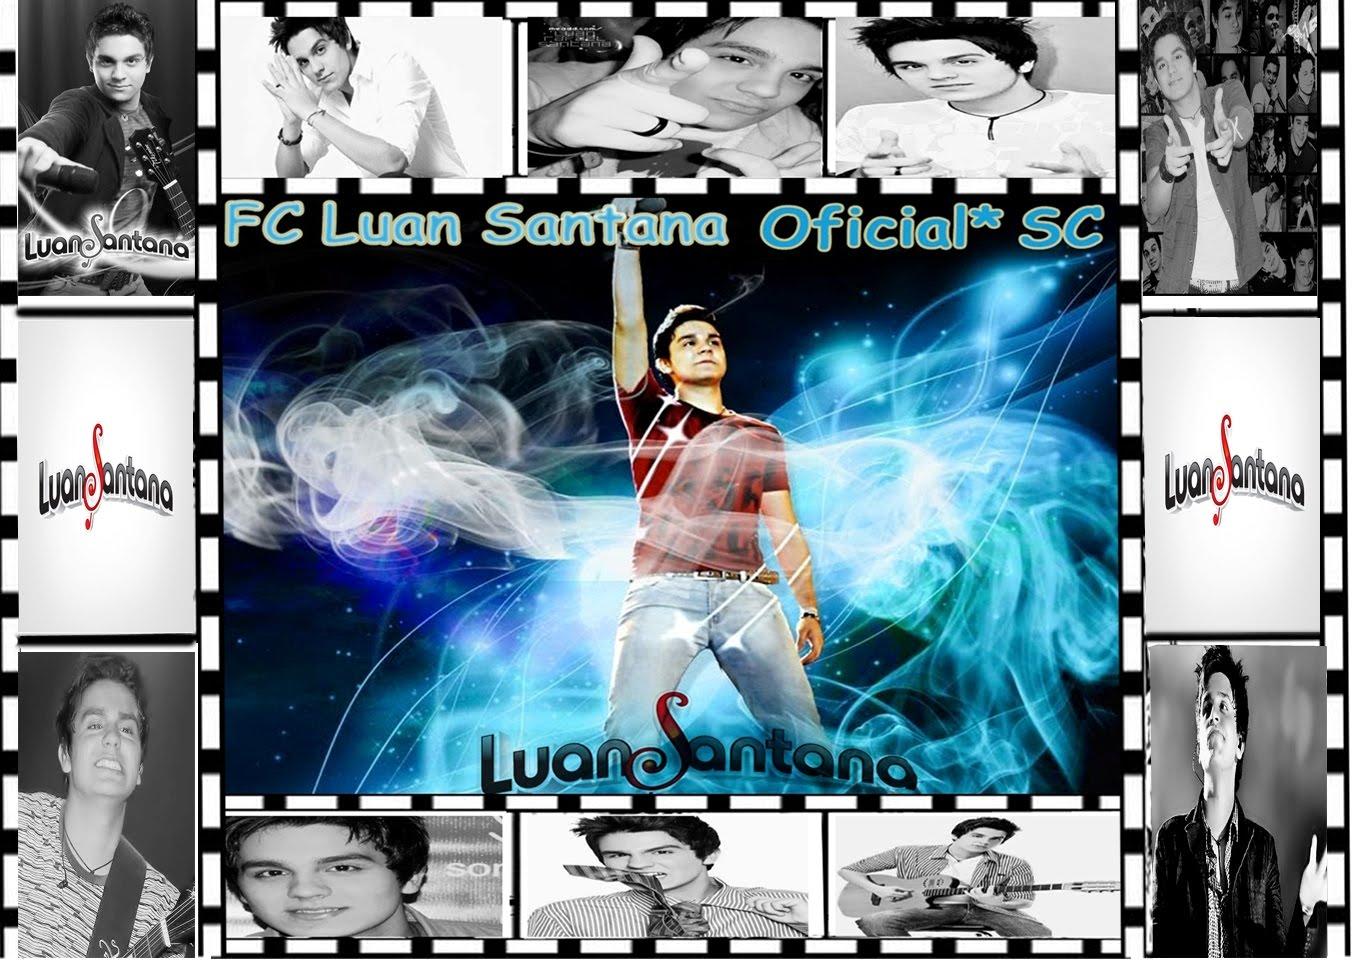 FC Luan Santana Oficial* SC